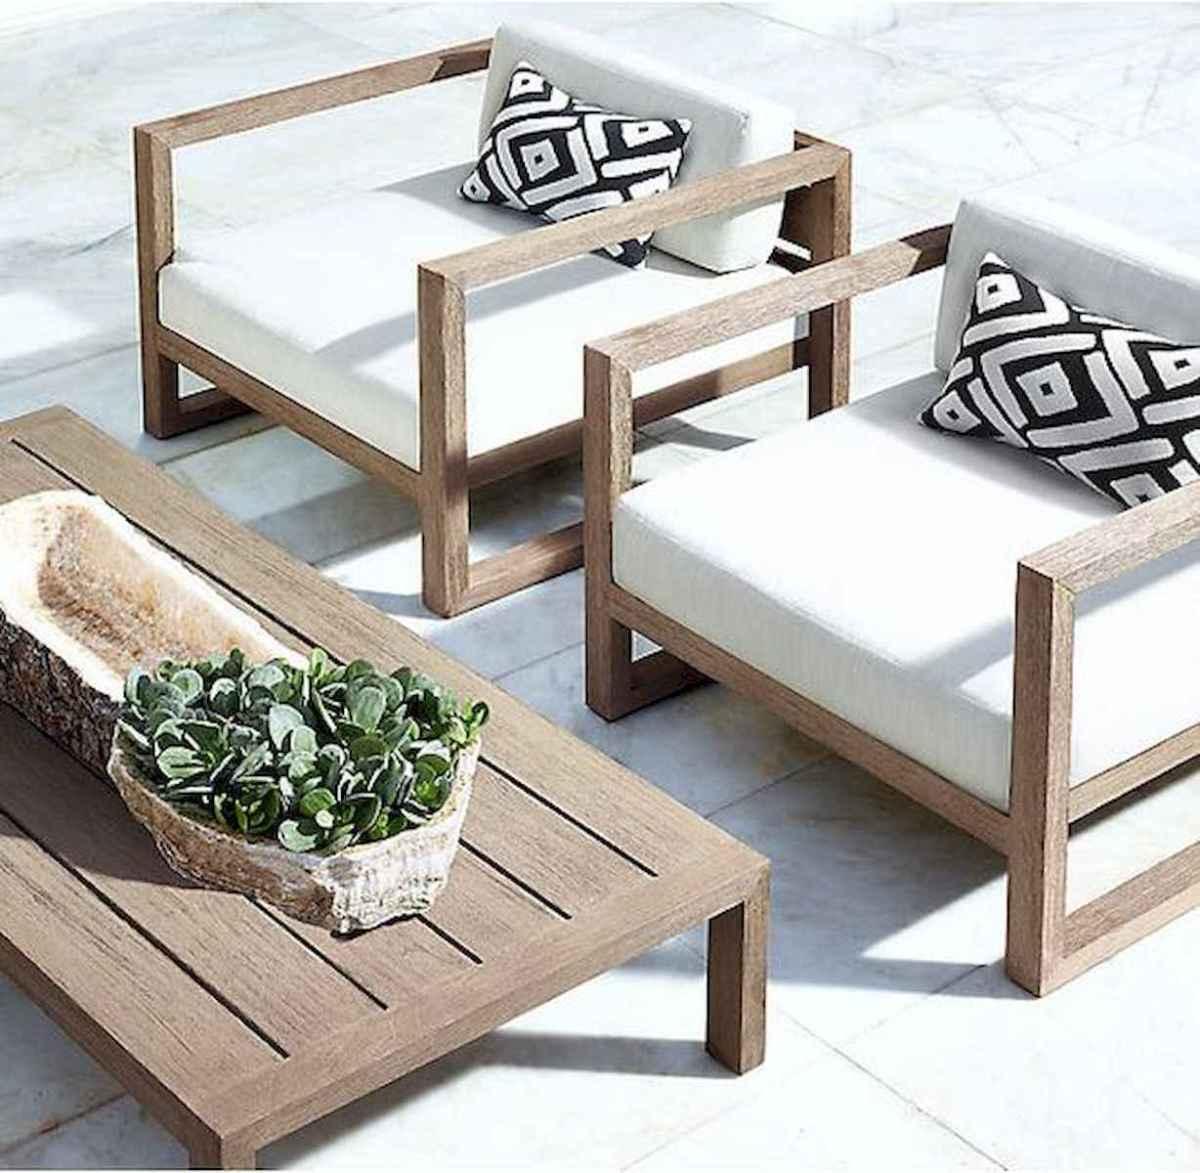 60 Amazing DIY Projects Otdoors Furniture Design Ideas (21)